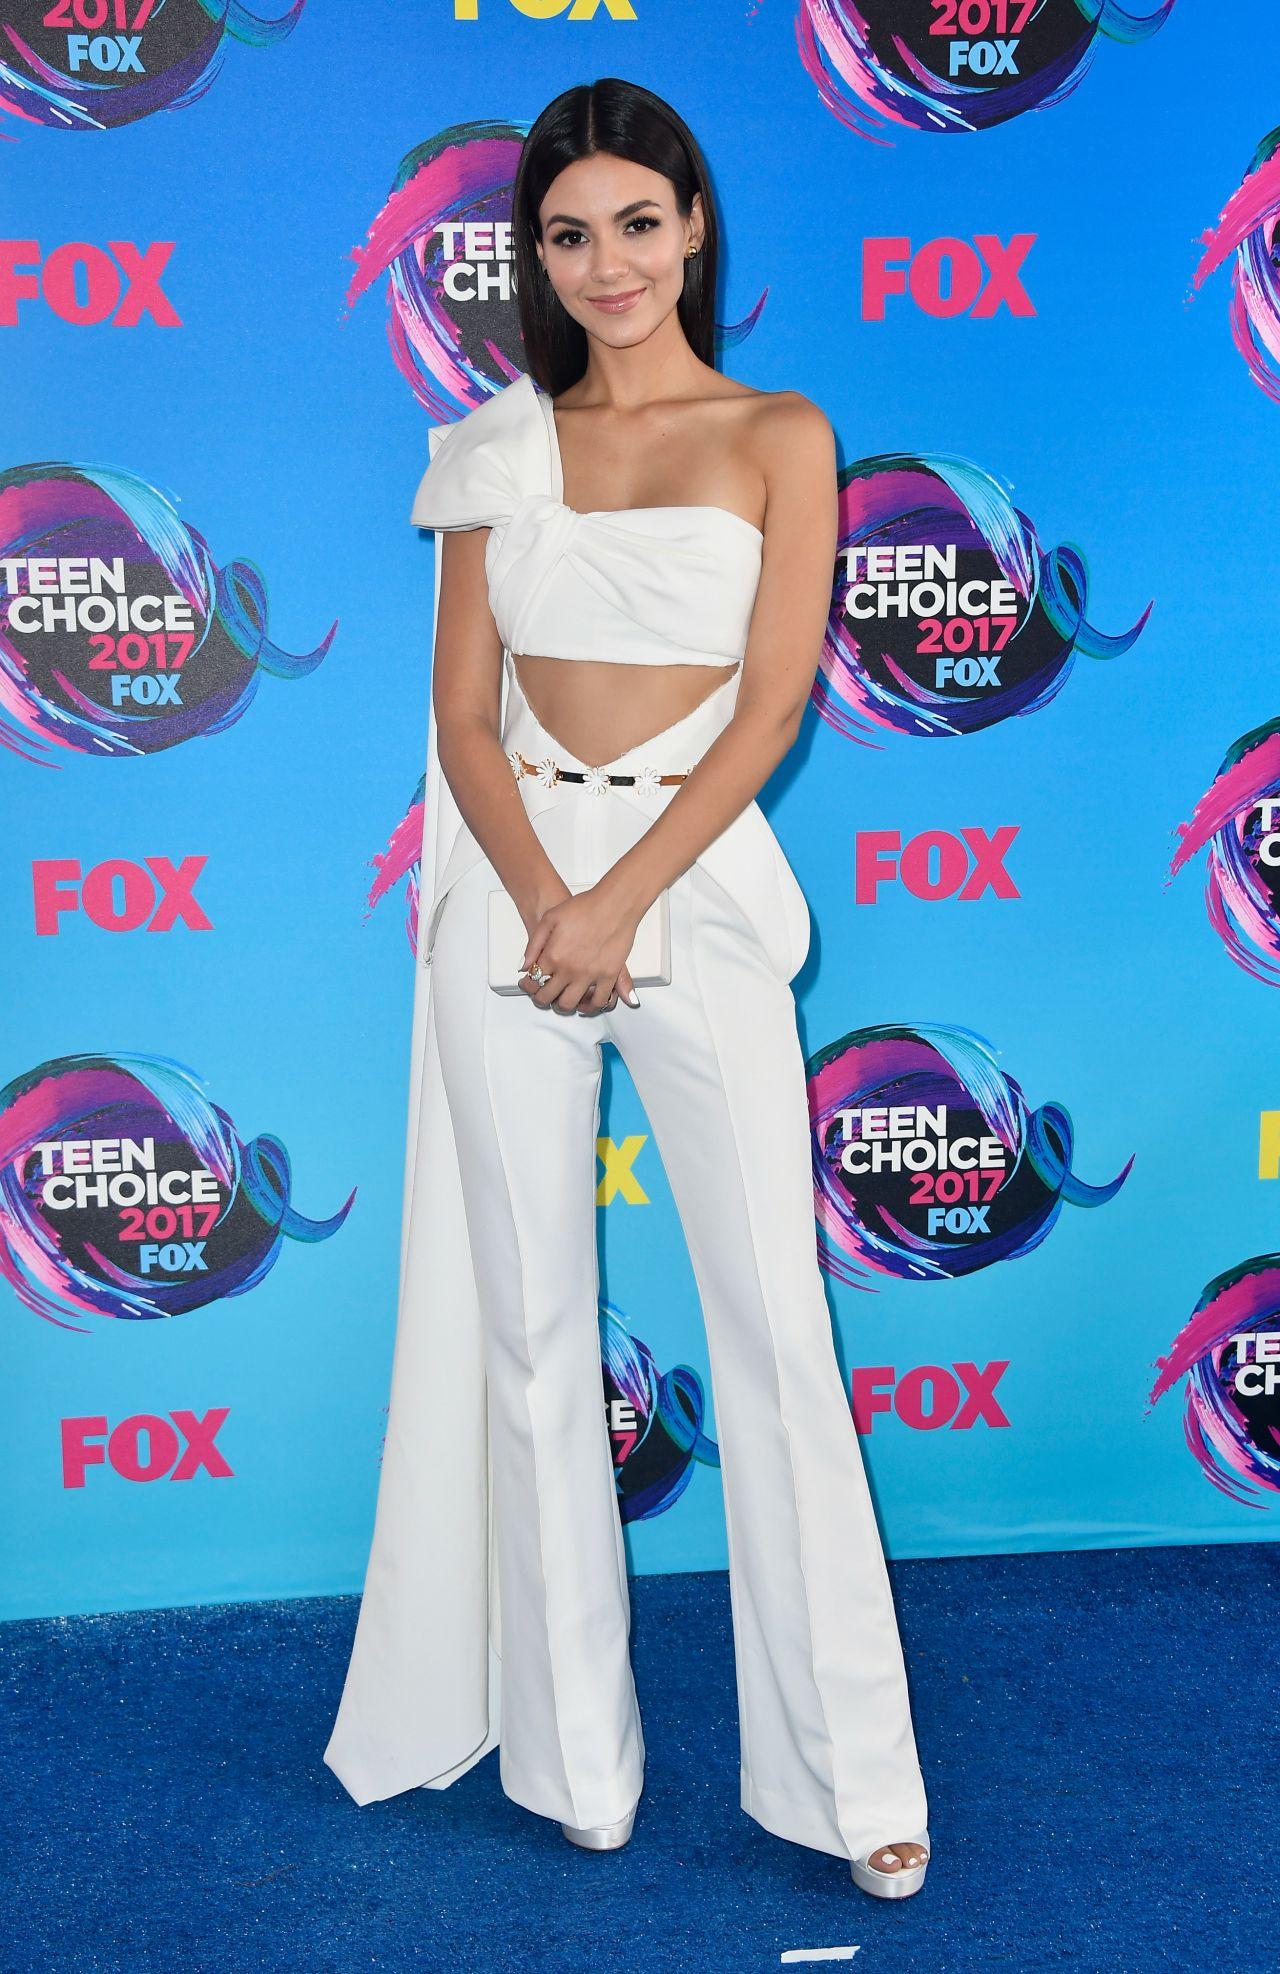 Teen Choice Awards In Los Angeles 08/13